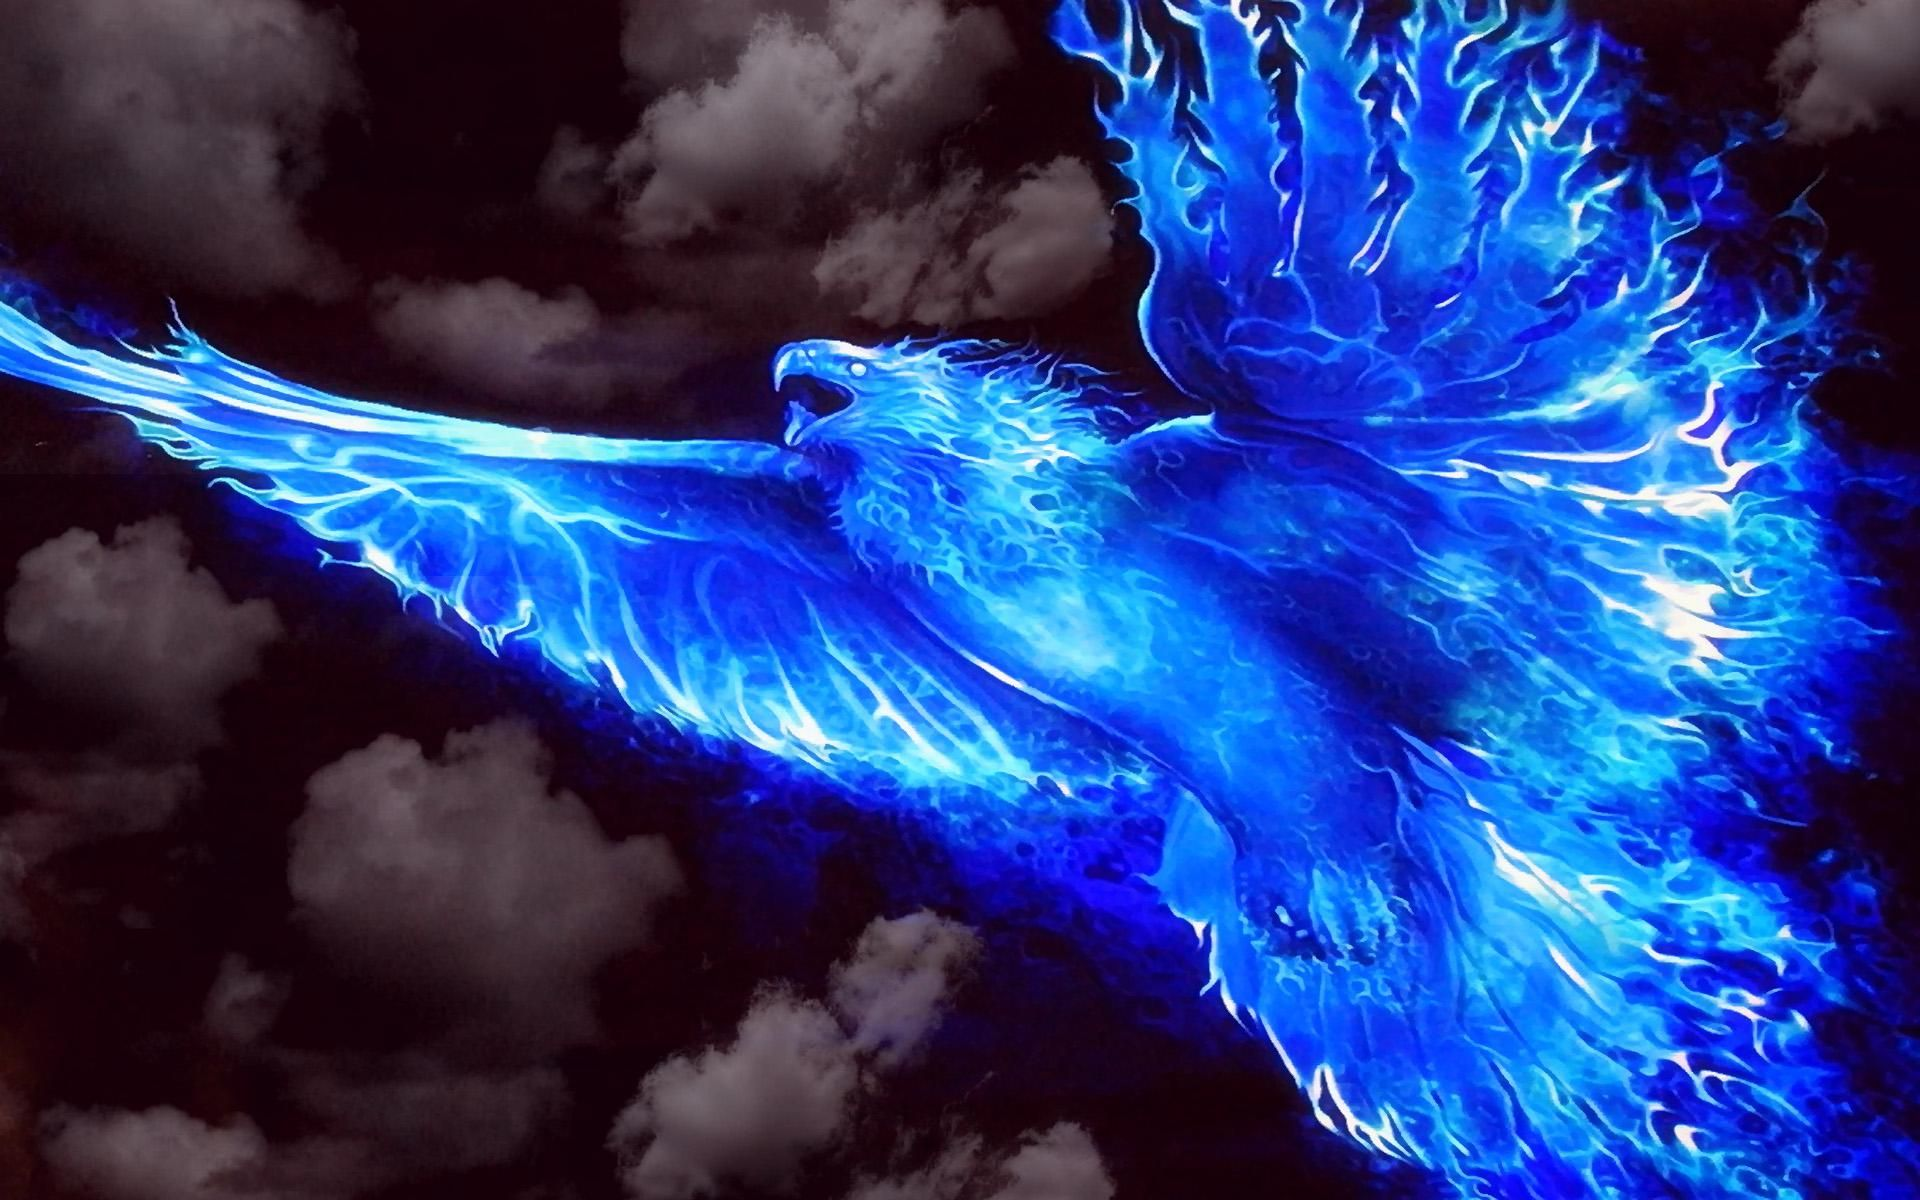 http://hqwallbase.pw/images/big/fire_bird-1566100.jpg